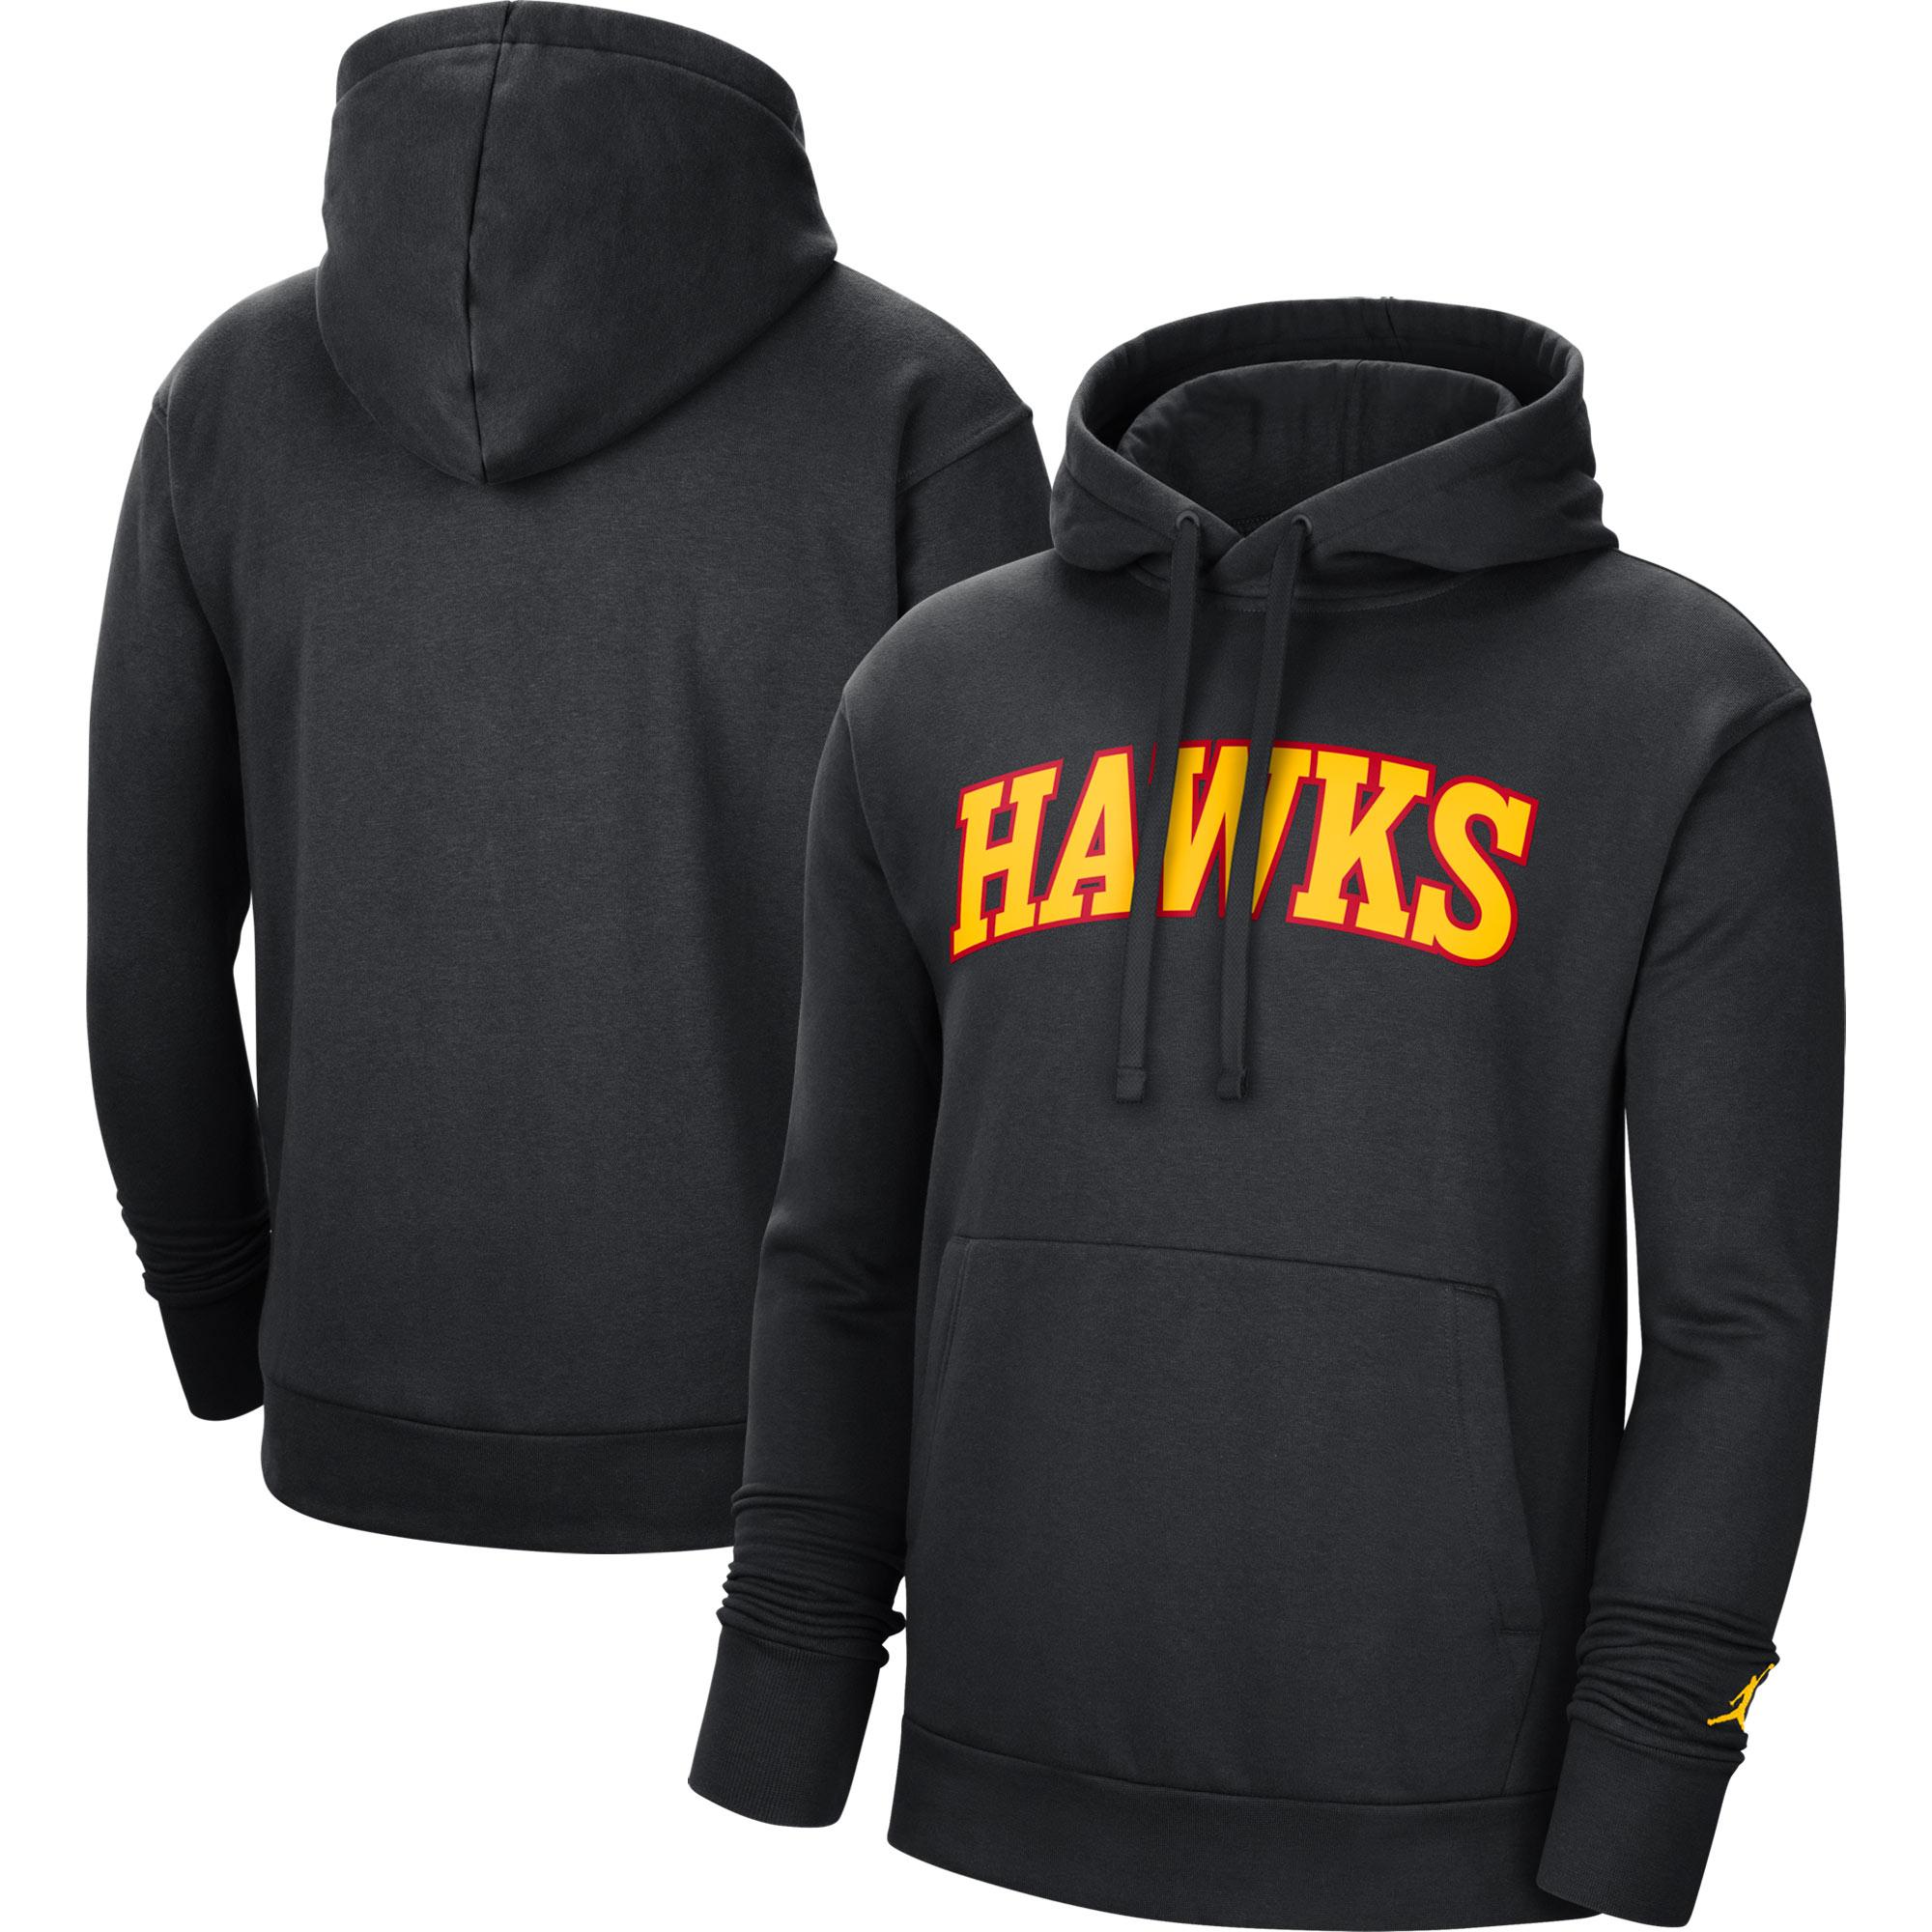 Atlanta Hawks Jordan Brand Statement Edition Pullover Hoodie - Black